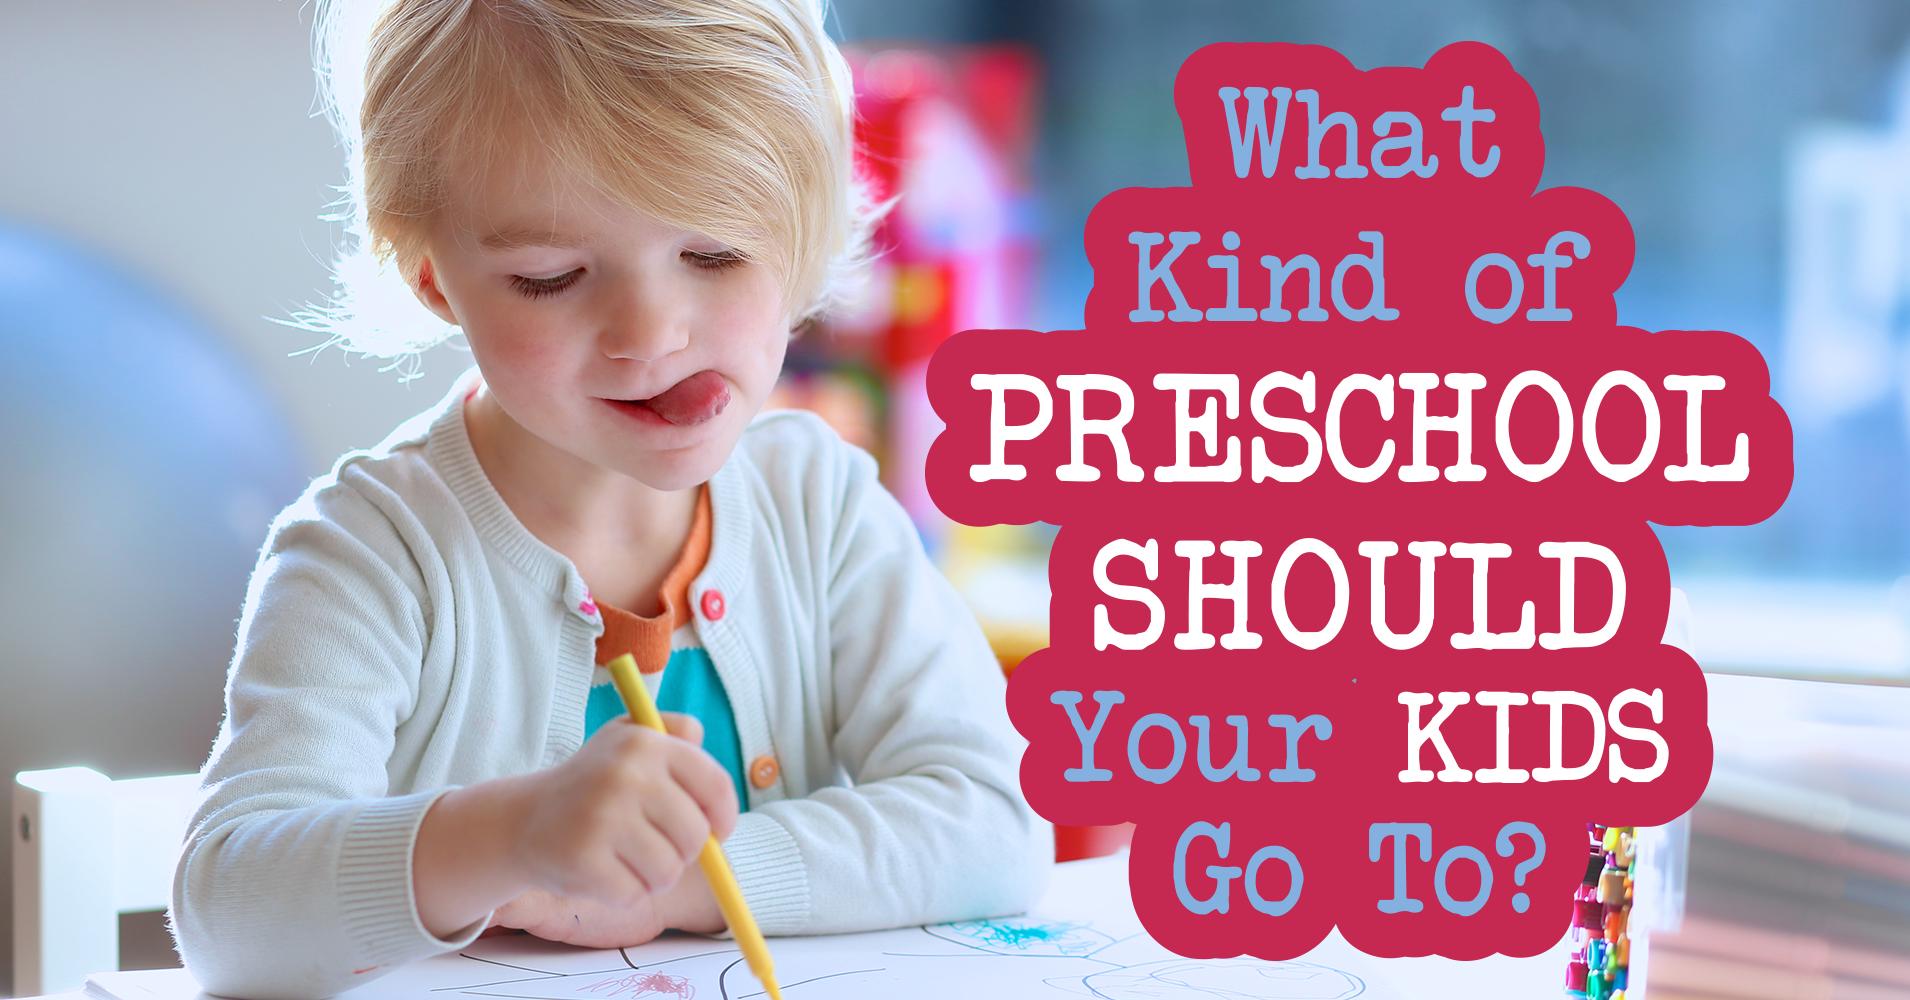 when do children go to preschool what of preschool should your go to question 1 959